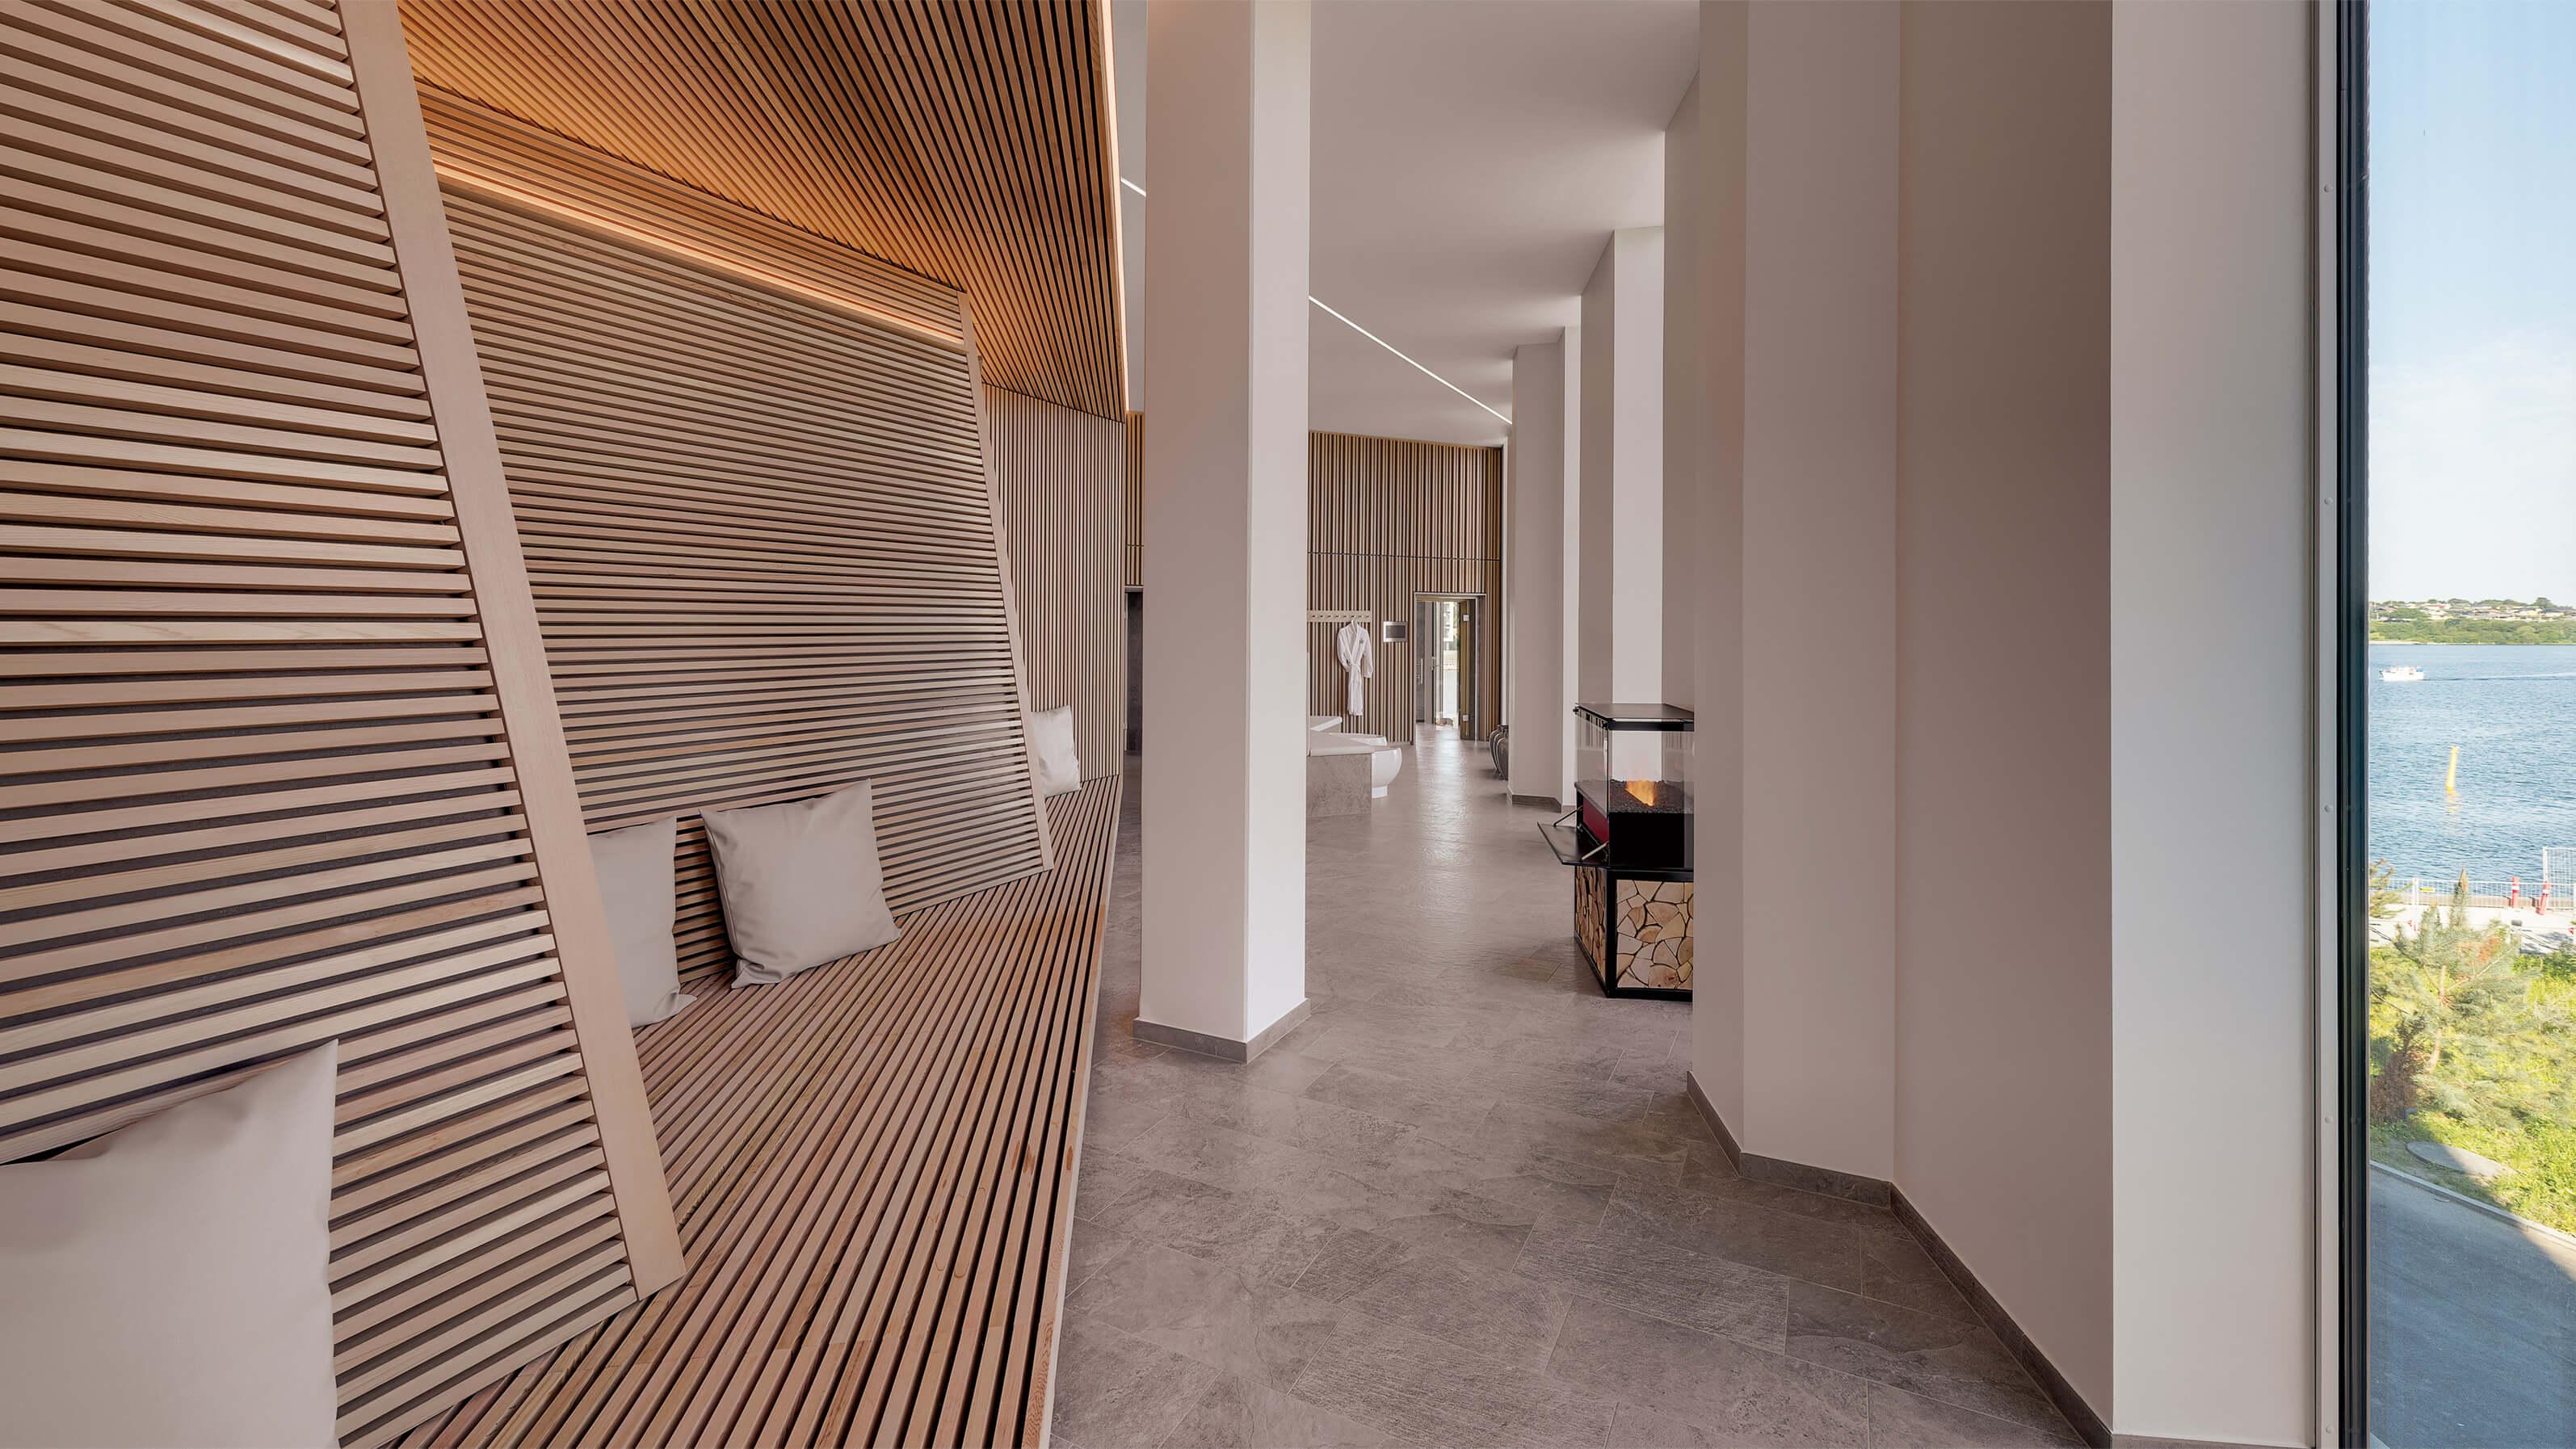 hotelausstattung-hoteleinrichtungen-bachhuber-Alsik-Sonderborg1